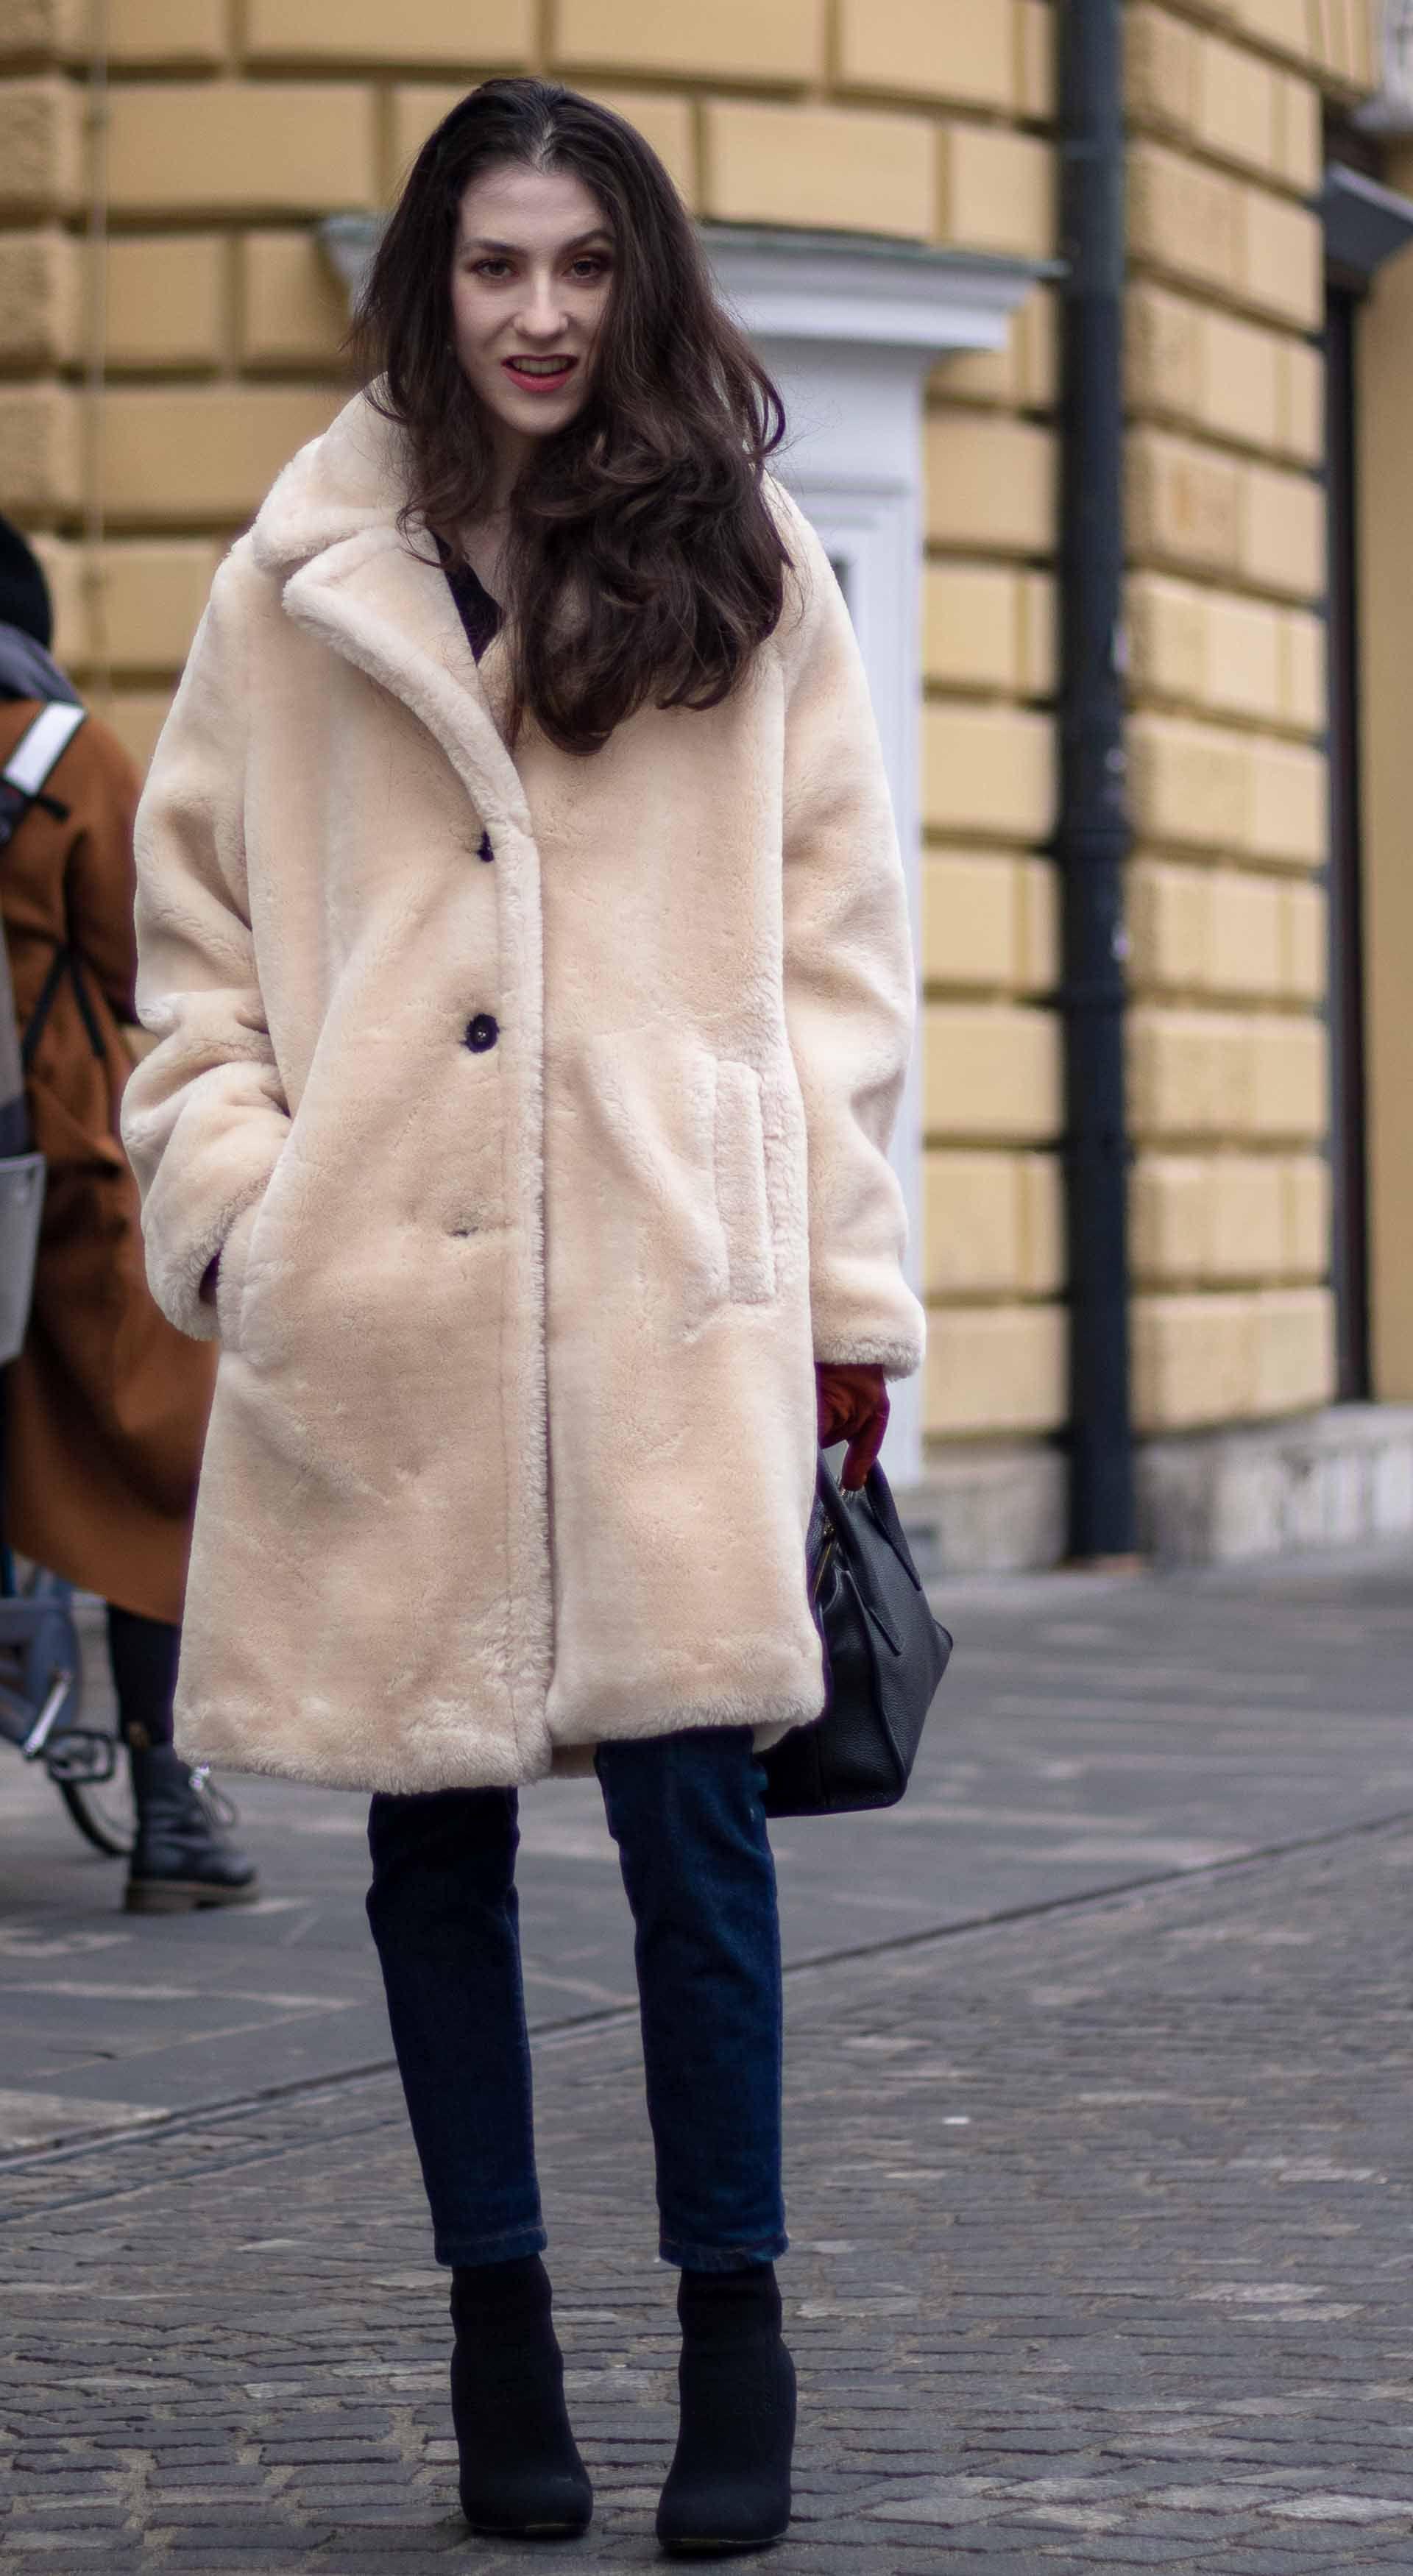 Fashion Blogger Veronika Lipar of Brunette from Wall Street sharing IT 9-5 2019  winter 41d47a3672fcb